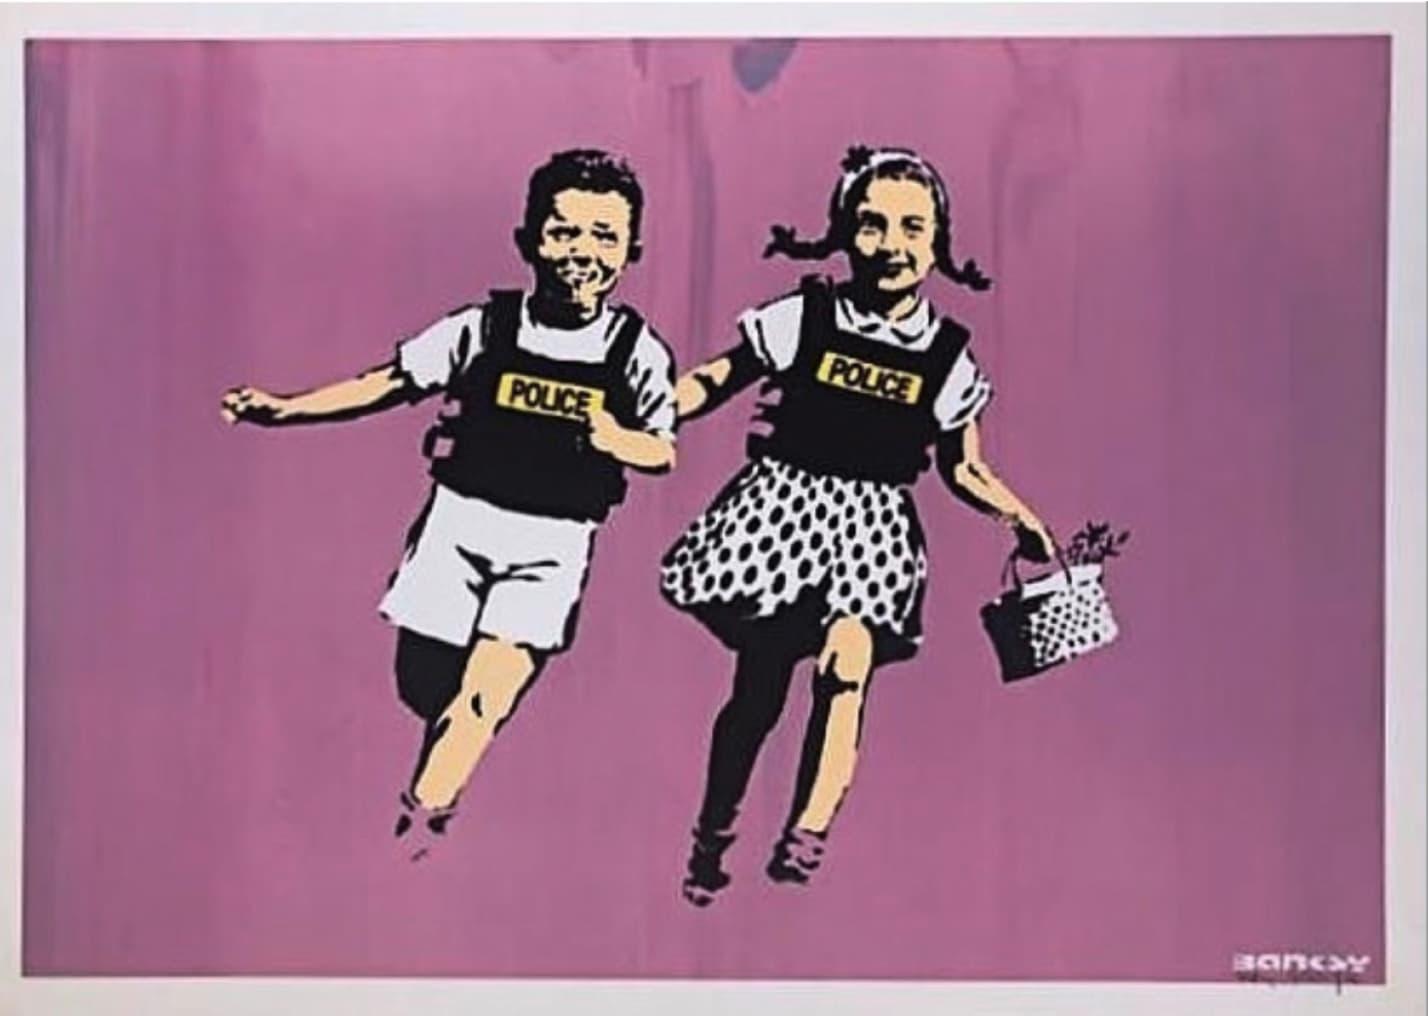 Banksy Jack and Jill (Signed) Screenprint